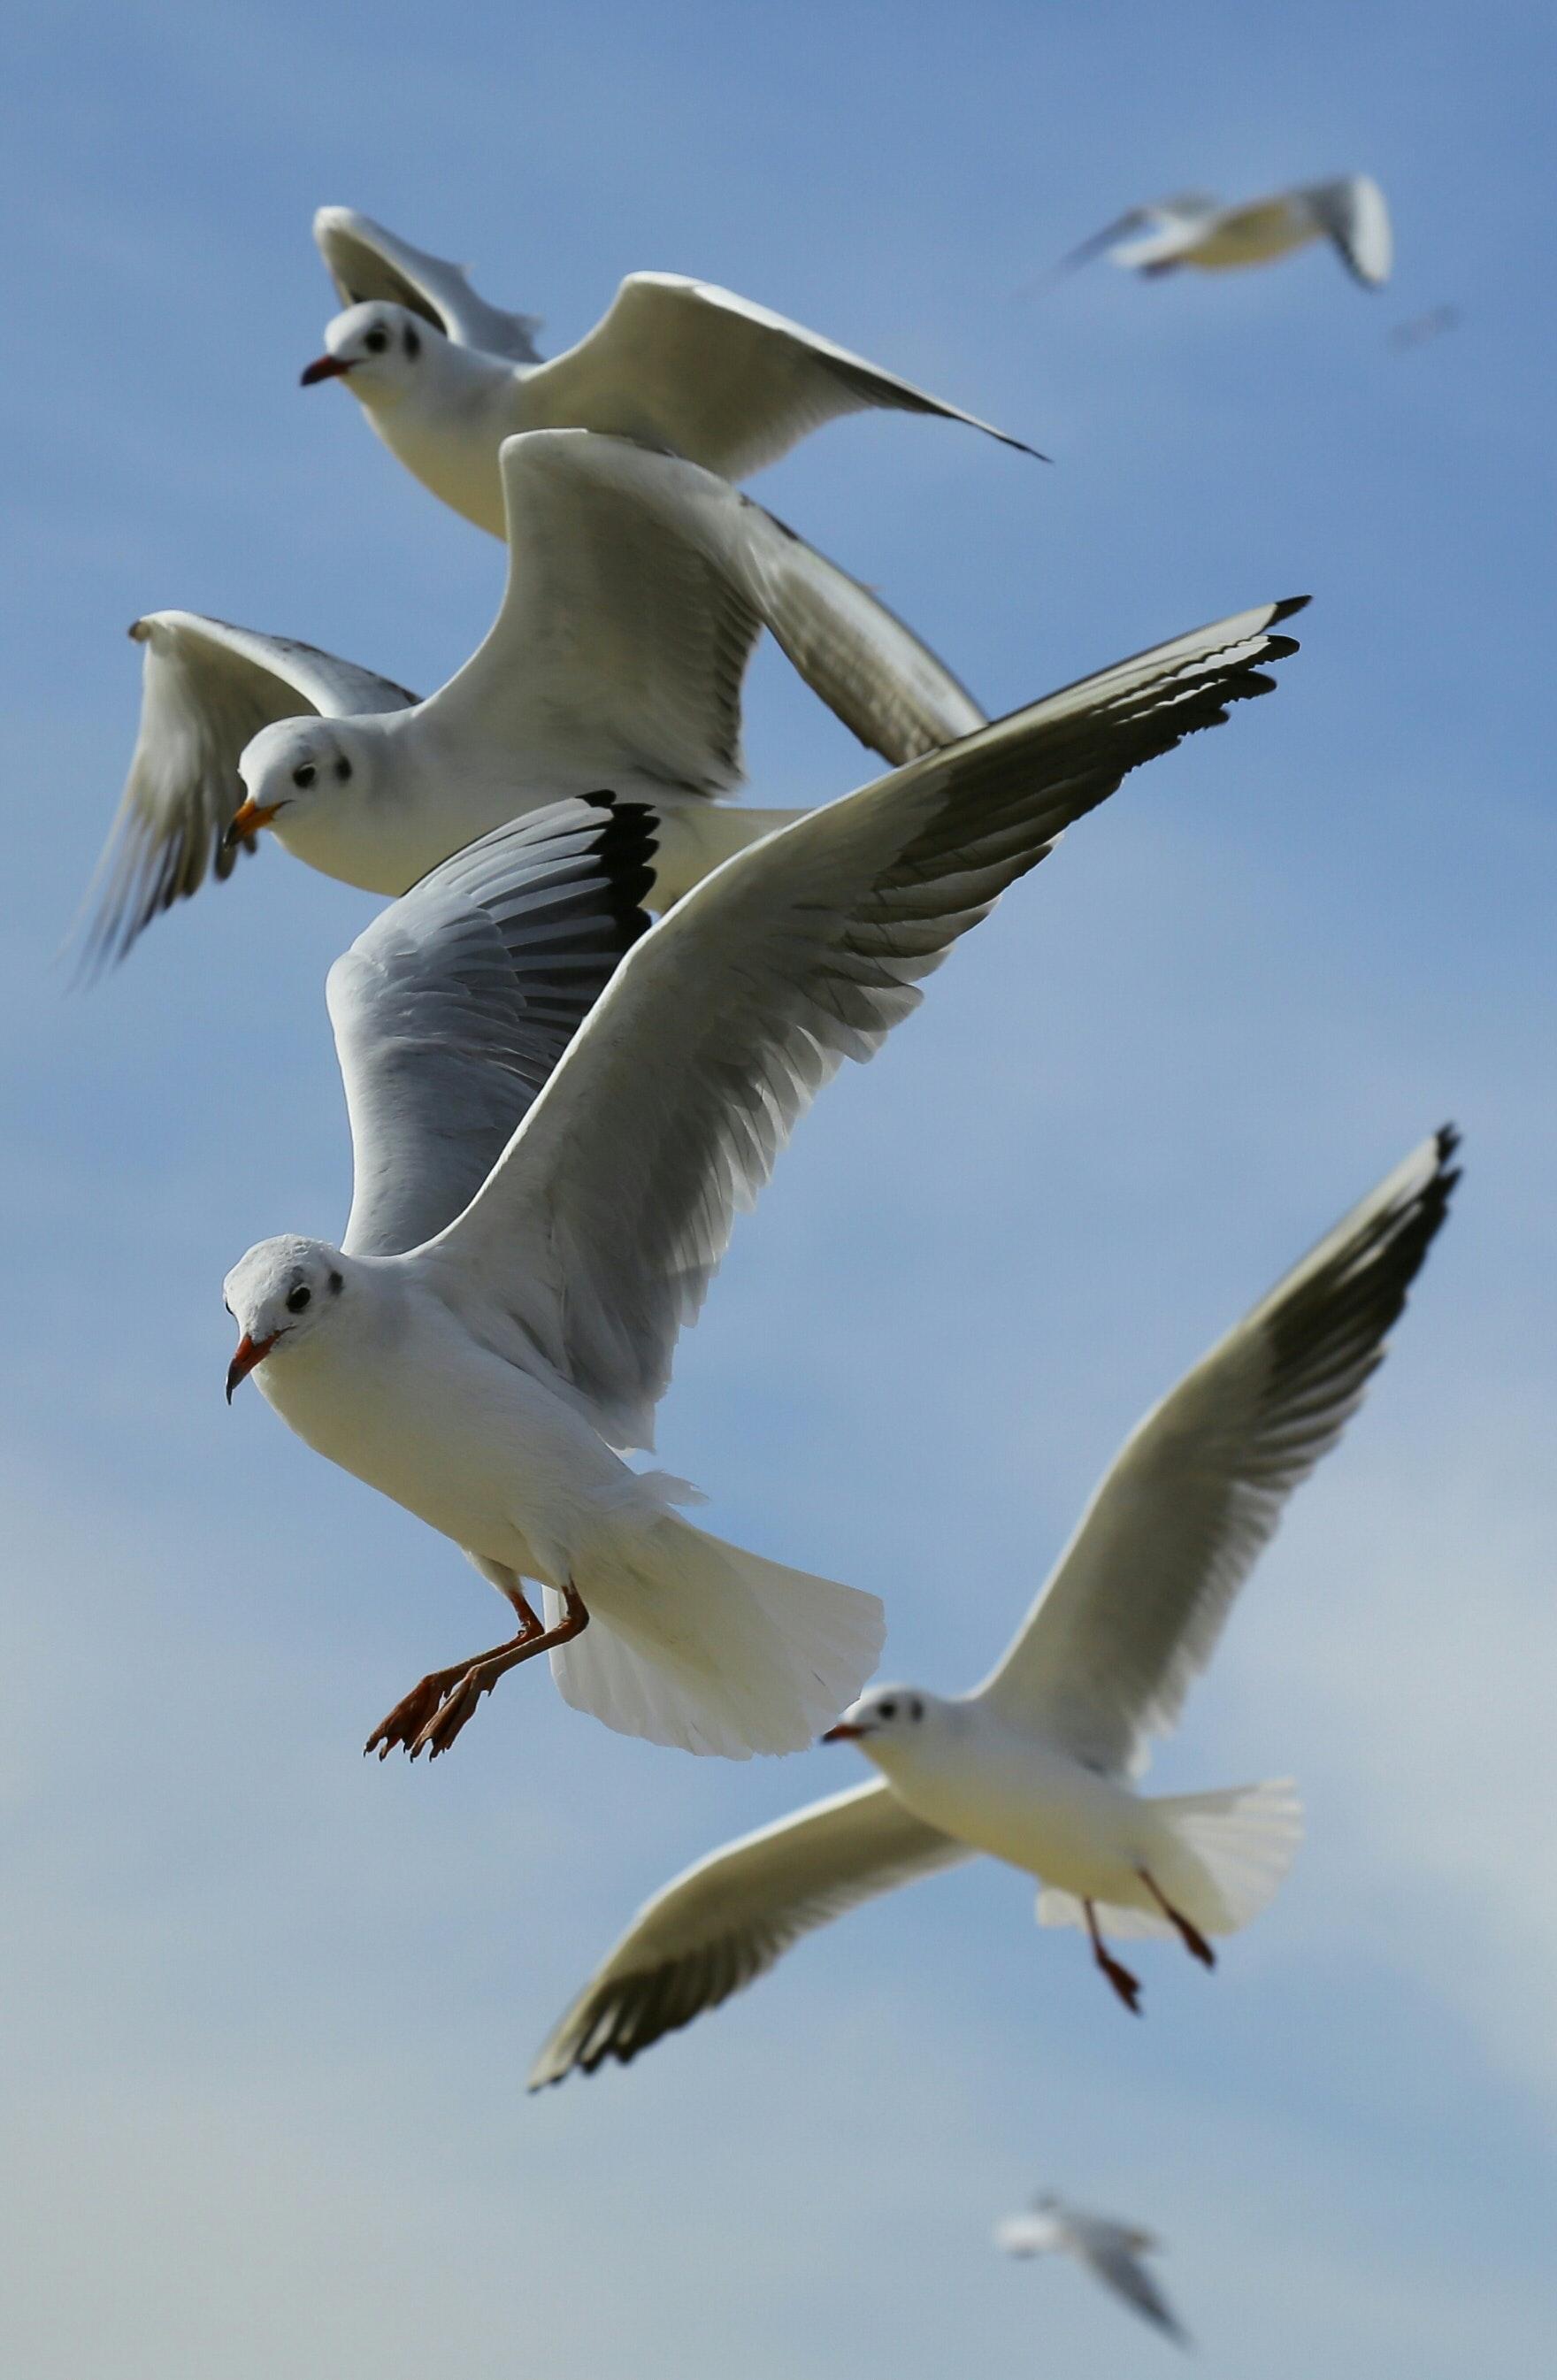 Download 82 Gambar Burung Camar Terbang Paling Bagus Gratis